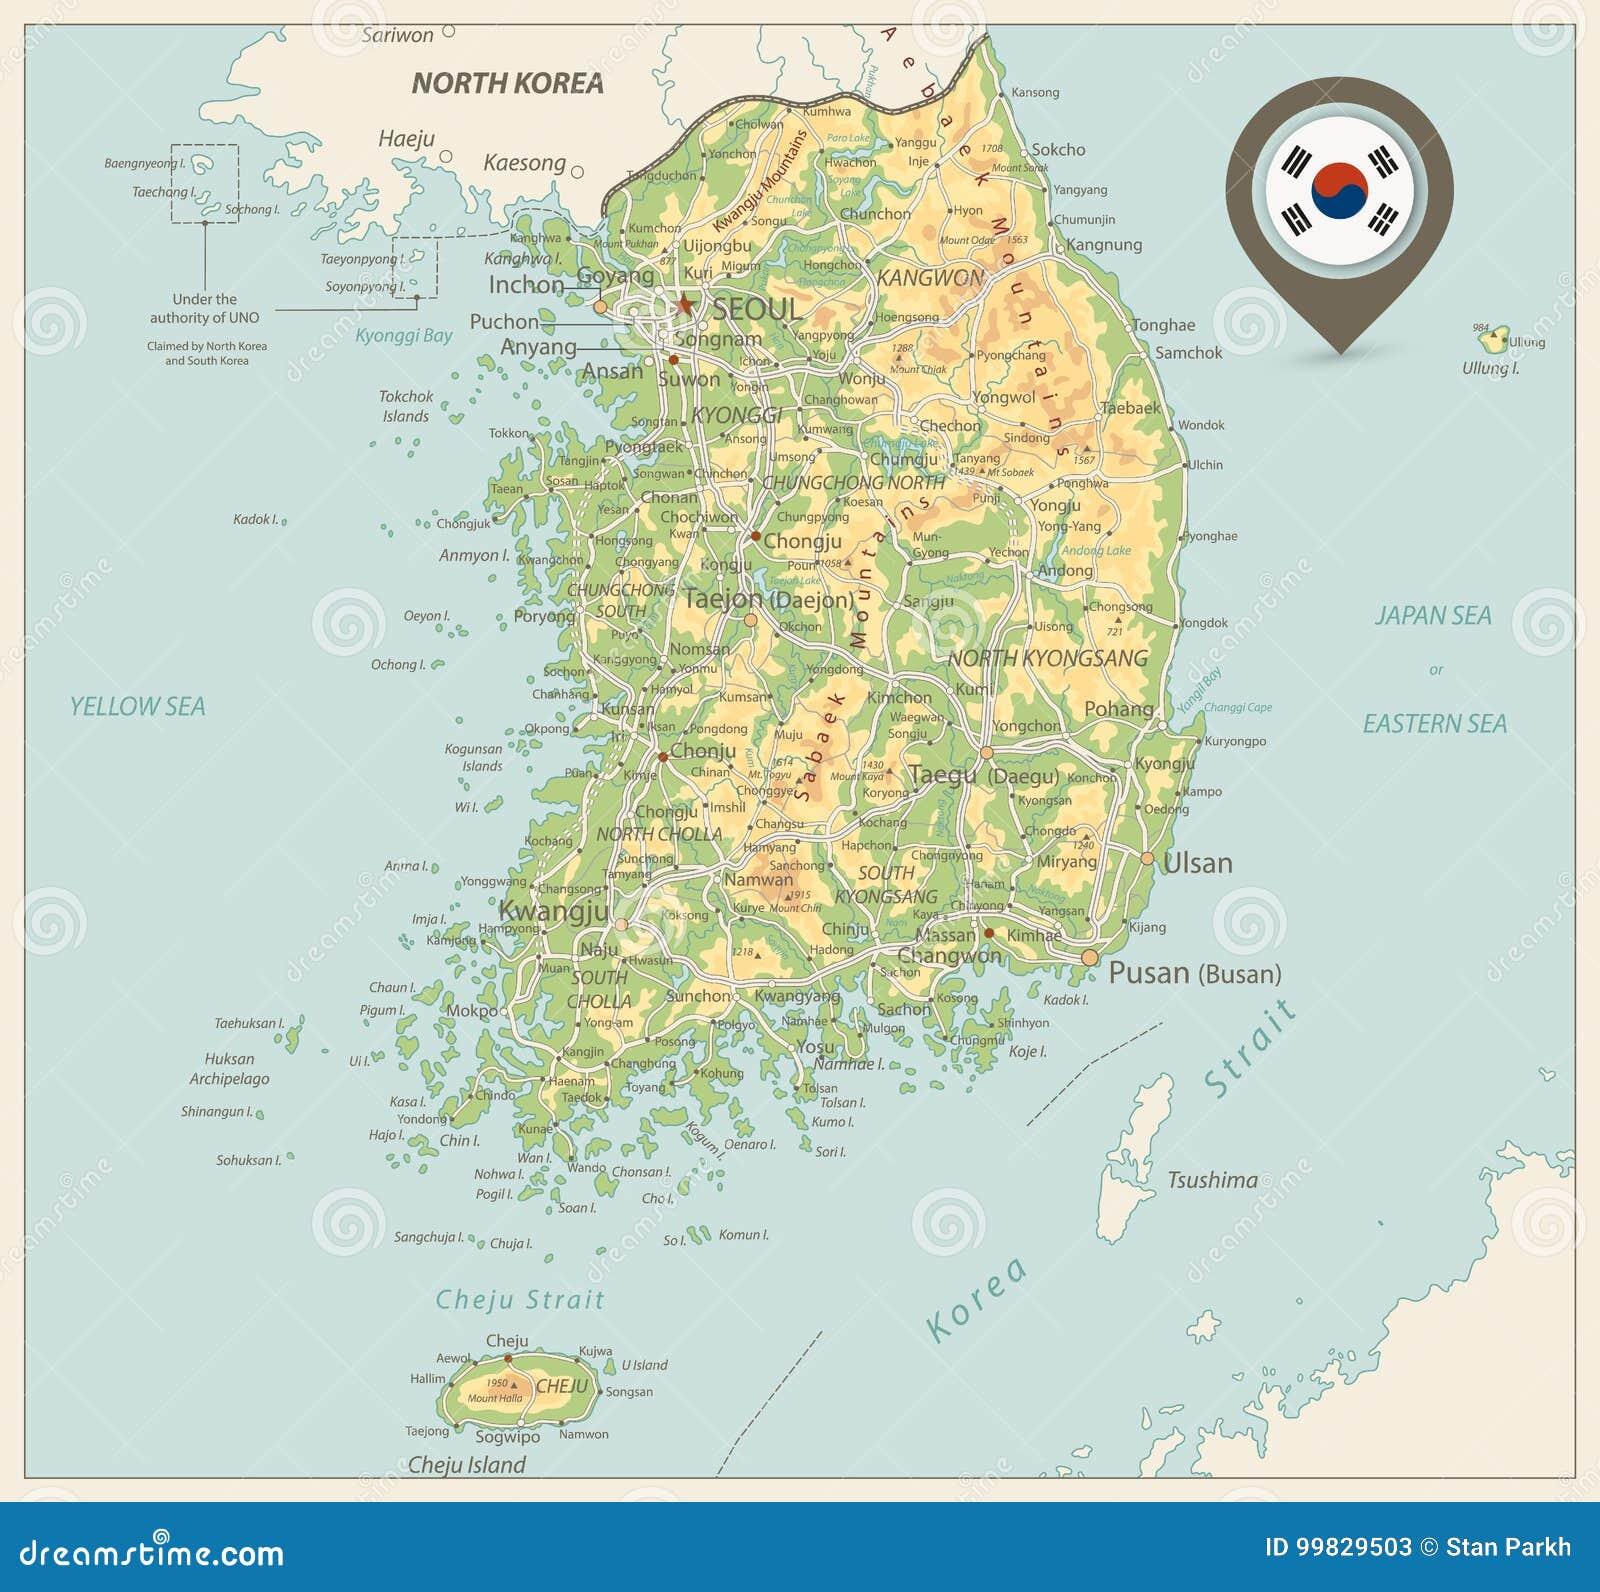 South Korea Physical Map. Retro Colors Stock Vector - Illustration on mekong river map, grand canal map, luzon strait map, monaco bay map, taklamakan desert map, hangzhou bay, florida bay map, bohai sea, indonesia map, gulf of tonkin map, mongolian plateau map, yellow sea map, mu us desert map, tatar strait map, korea water park, south bay map, korean empire map, bo hai map, mexico bay map, yellow sea, pacific ocean map, yalu river, the aquariums of pyongyang, goryeo map, qinghai lake map, liaodong bay, north pyongan,